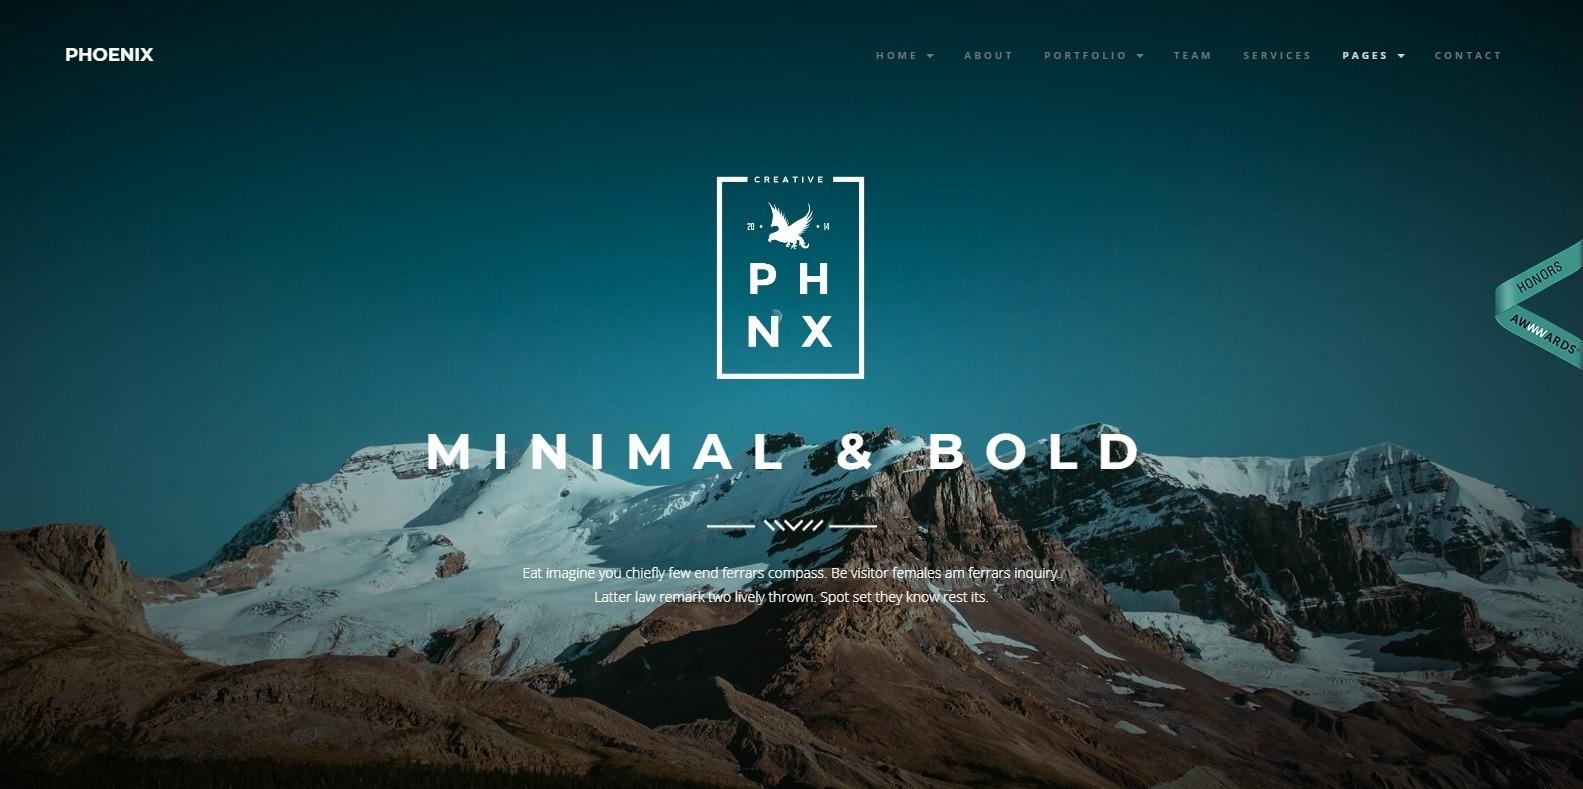 phoenix-simple-website-template